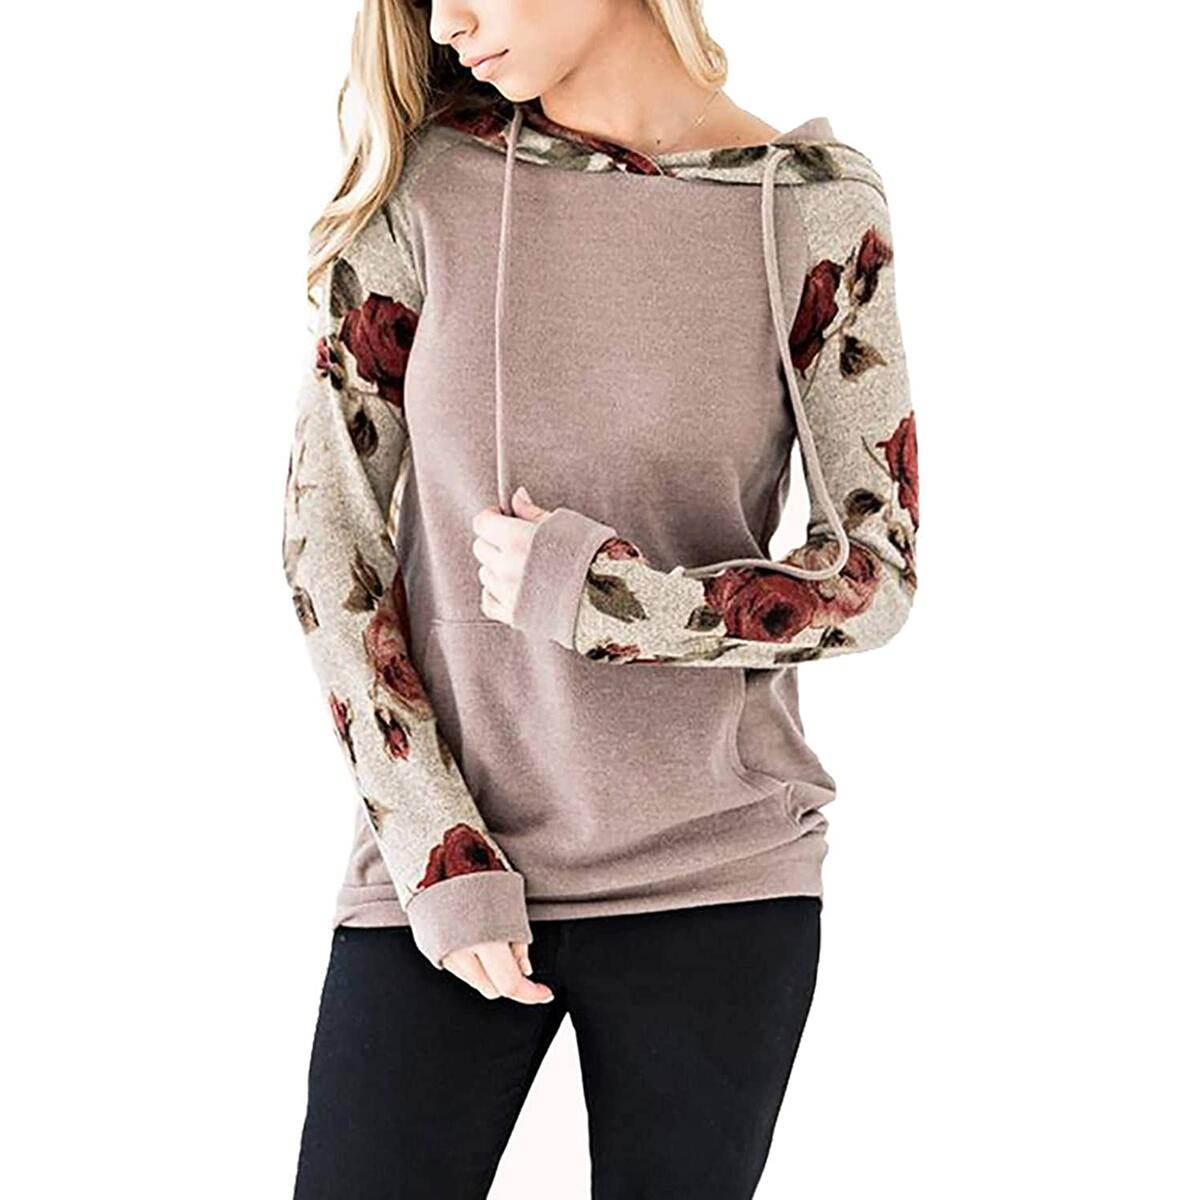 Minipeach Women's Pullover Long Sleeve Hoodies Coat Loose Casual Sweatshirts with Pocket Coffee